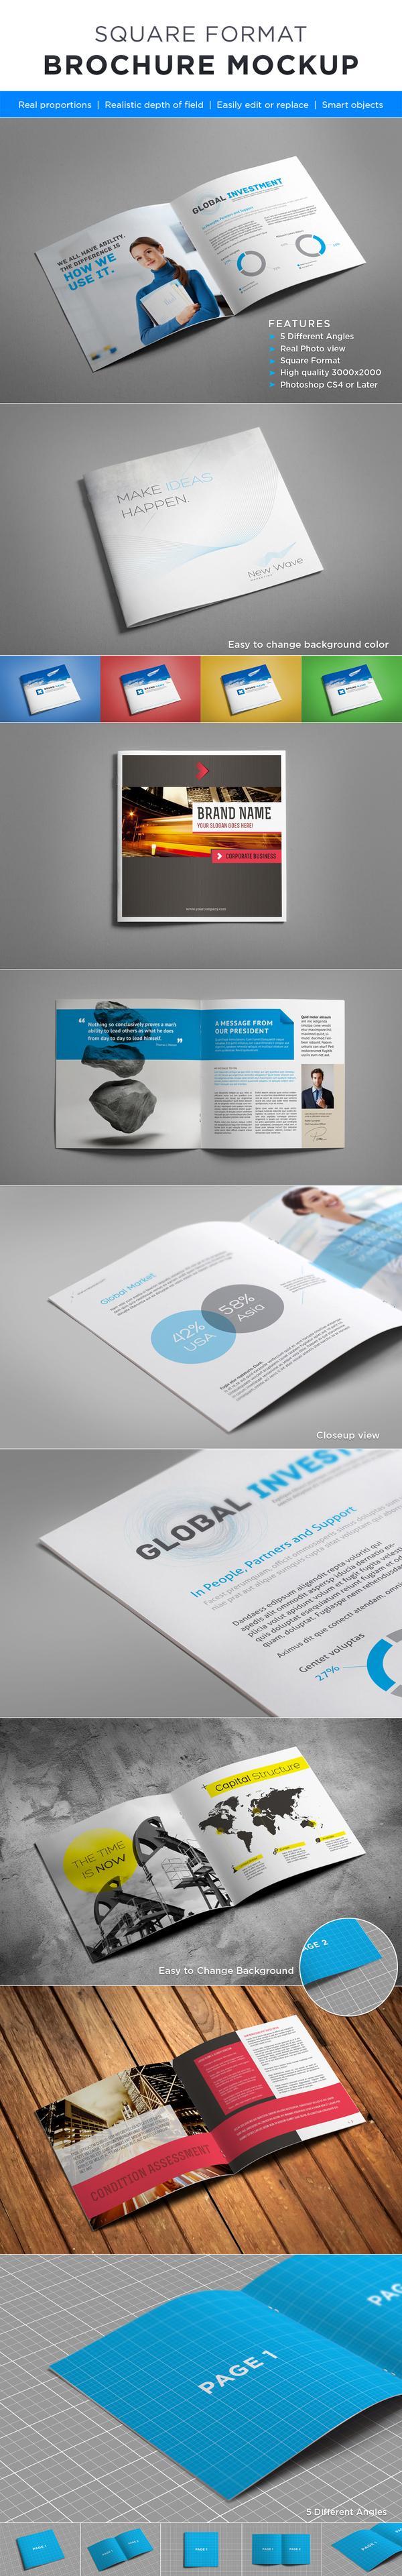 Brosur Perusahaan - Square Brochure Mock-up 1